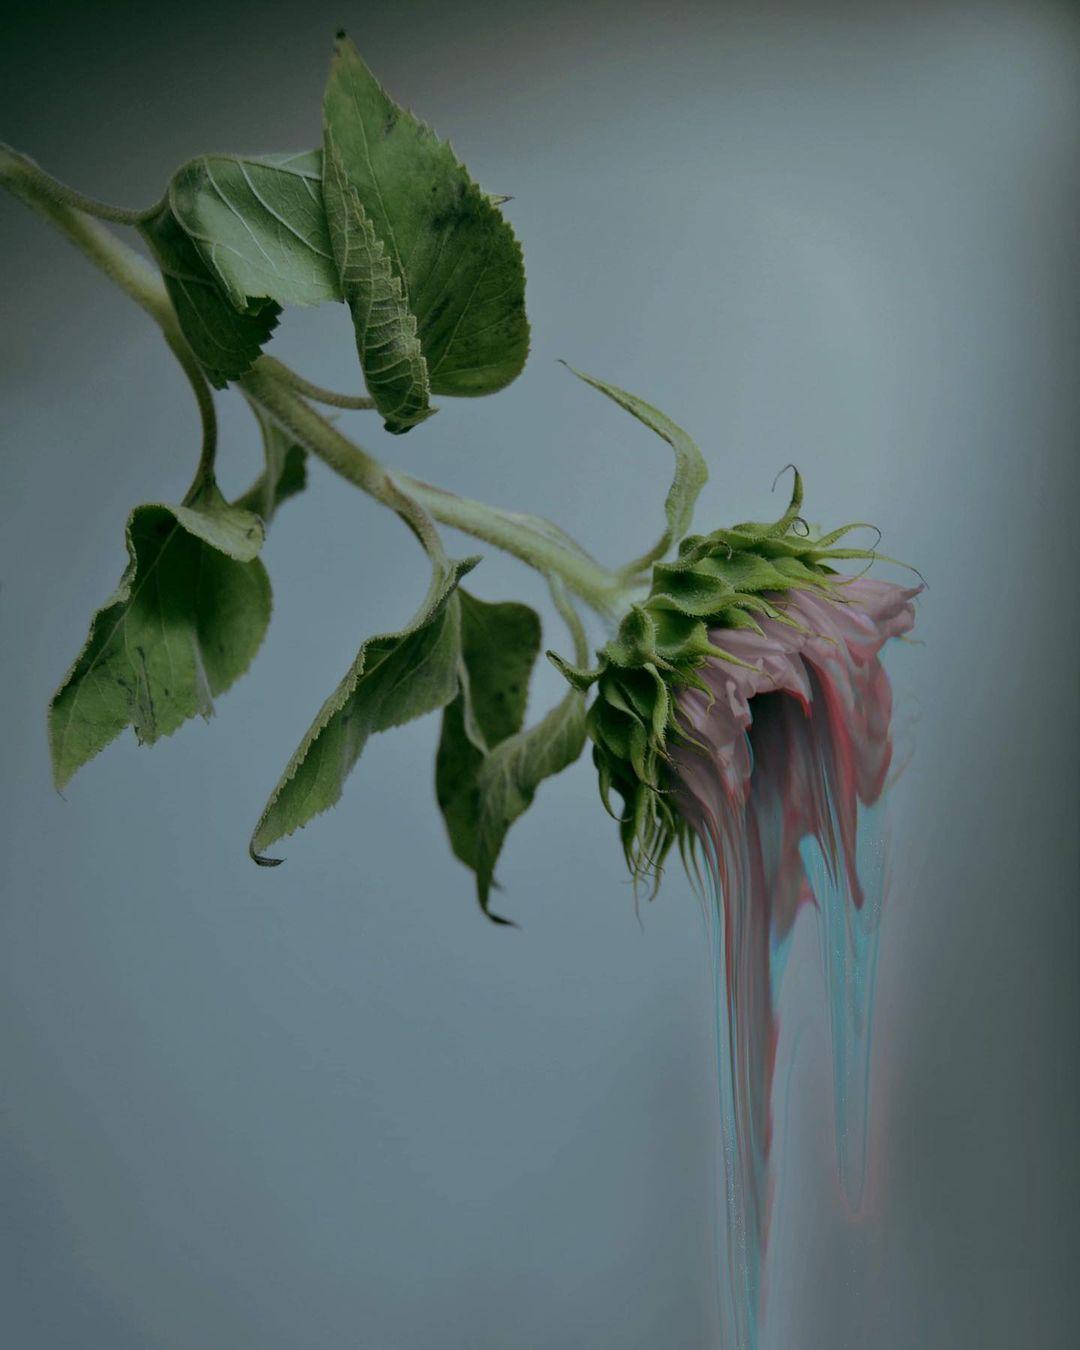 Anna Edholm Art #Anna Edholm#art#glitch#digital art#flowers#plants#pink#green#rose#pale#pastel#drip#trippy#aes#Aesthetic